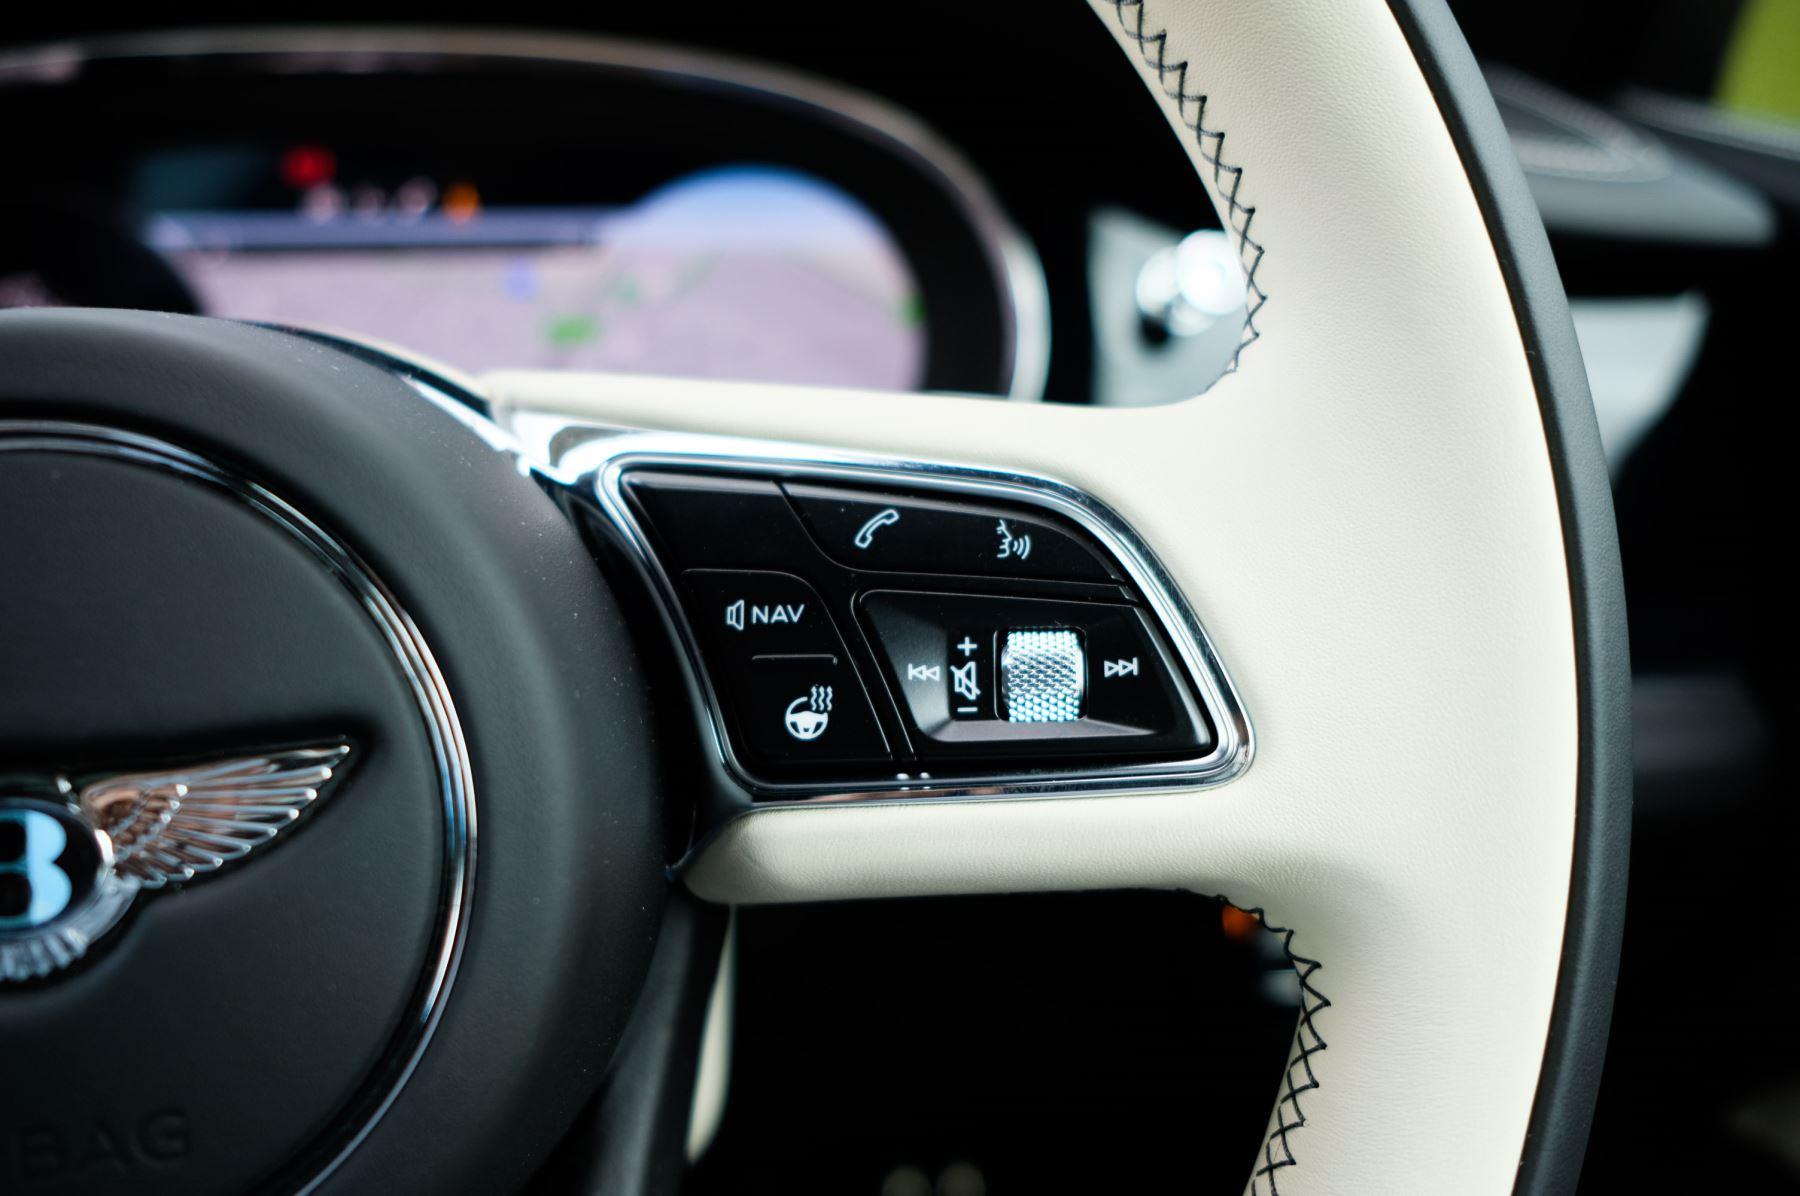 Bentley Bentayga 4.0 V8 - Mulliner Driving Specification for Black Specification image 25